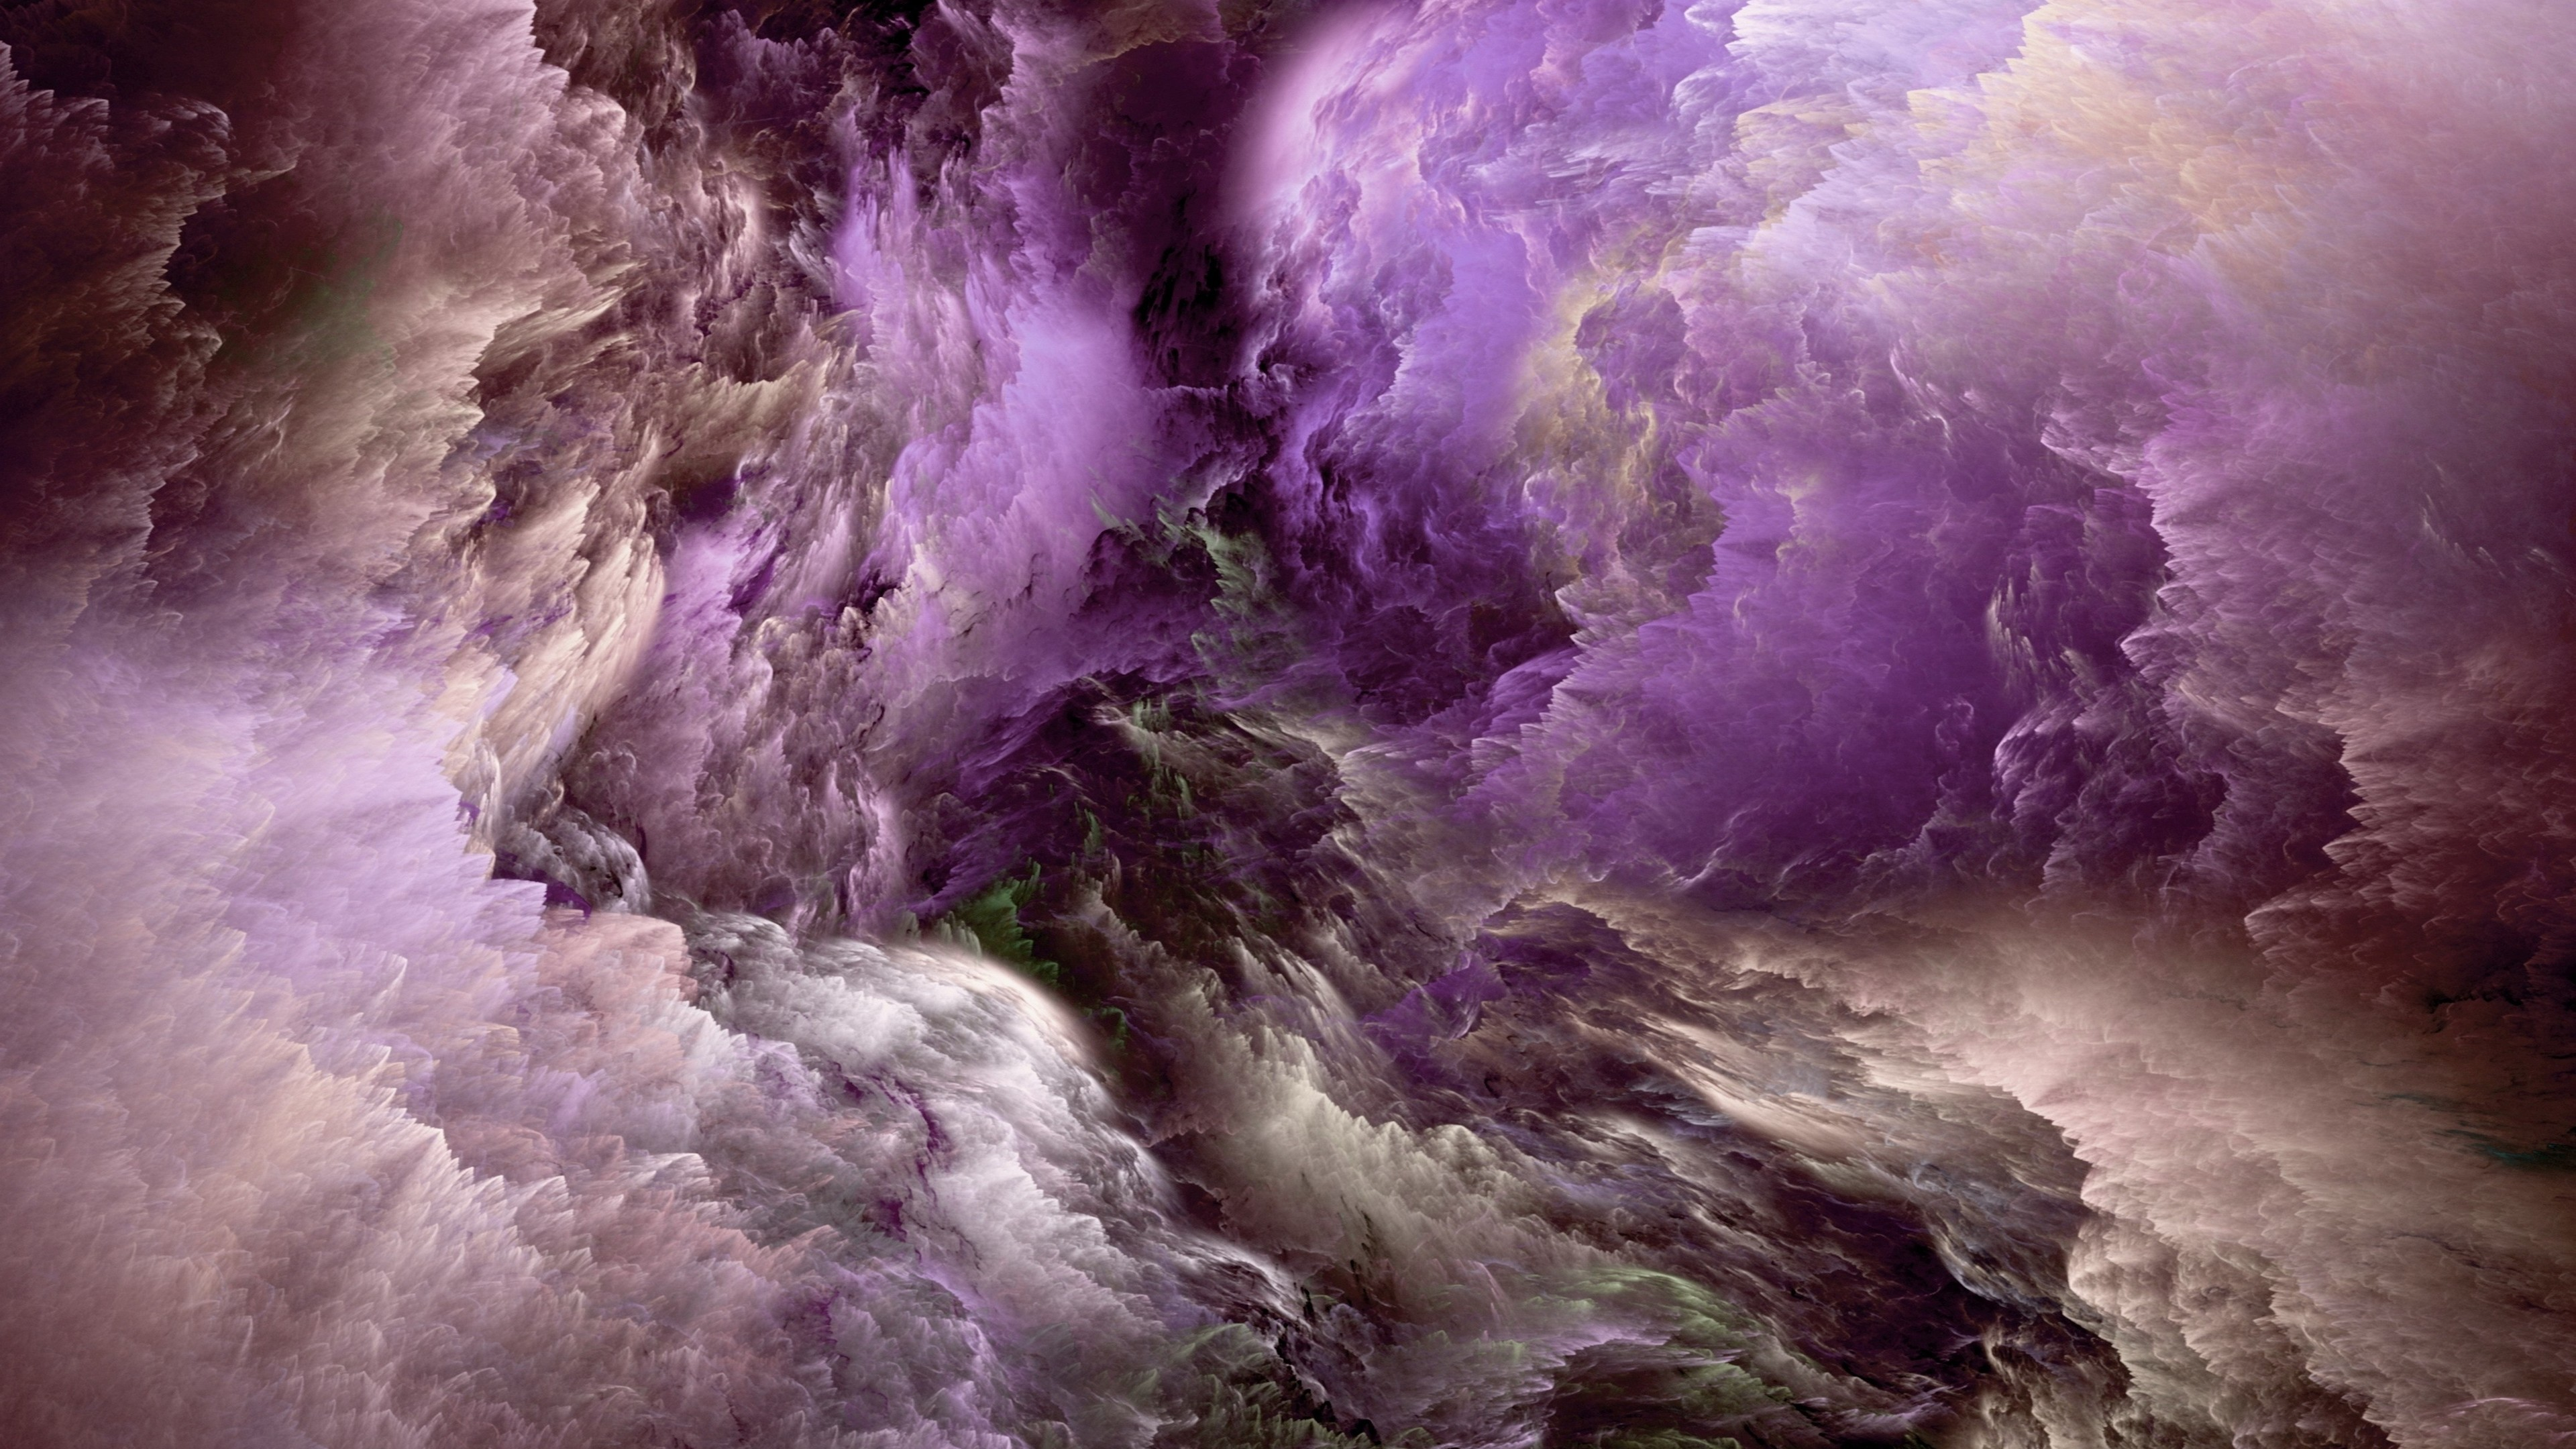 purple white clouds 4k 1540748640 - Purple White Clouds 4k - white wallpapers, purple wallpapers, digital art wallpapers, clouds wallpapers, artist wallpapers